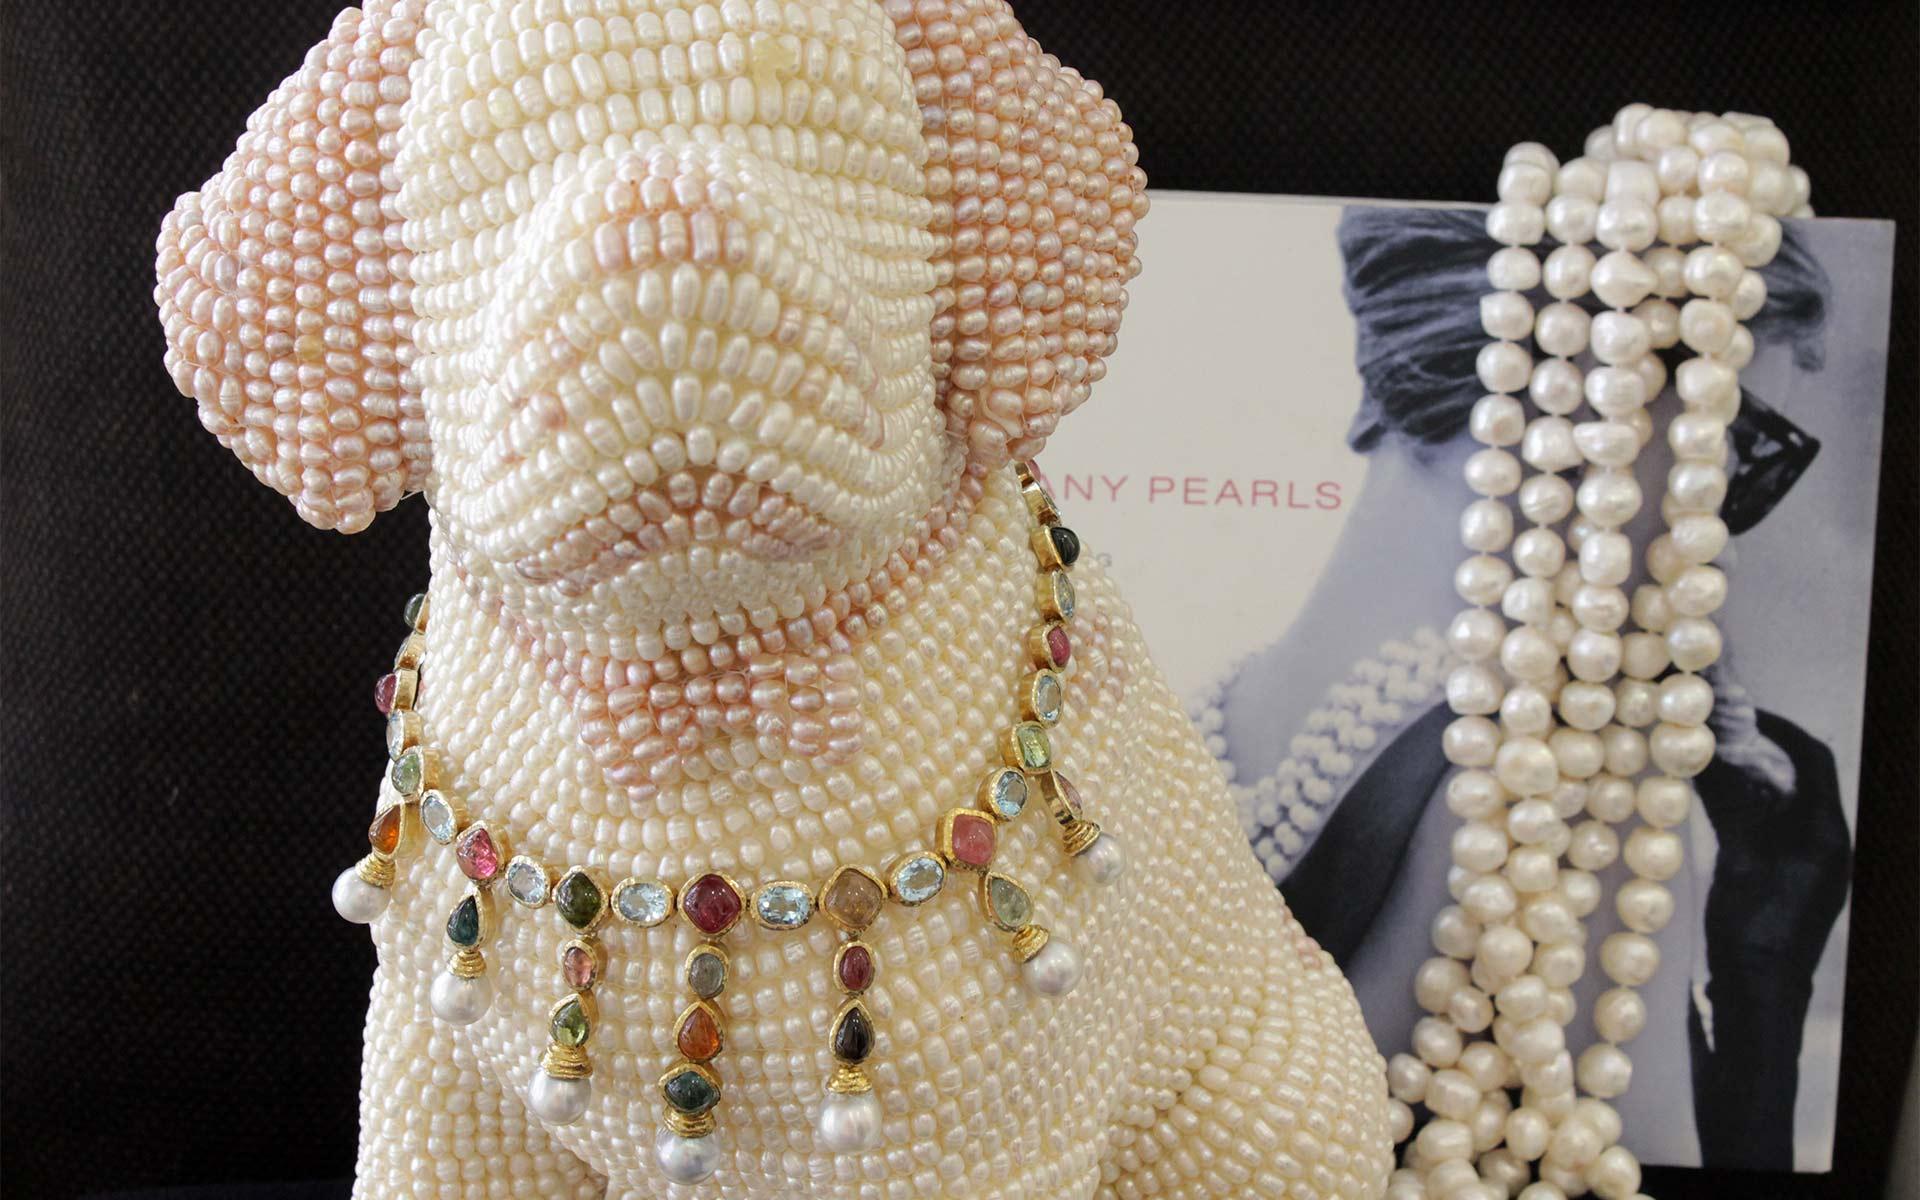 Pierre & Harry Jewelry